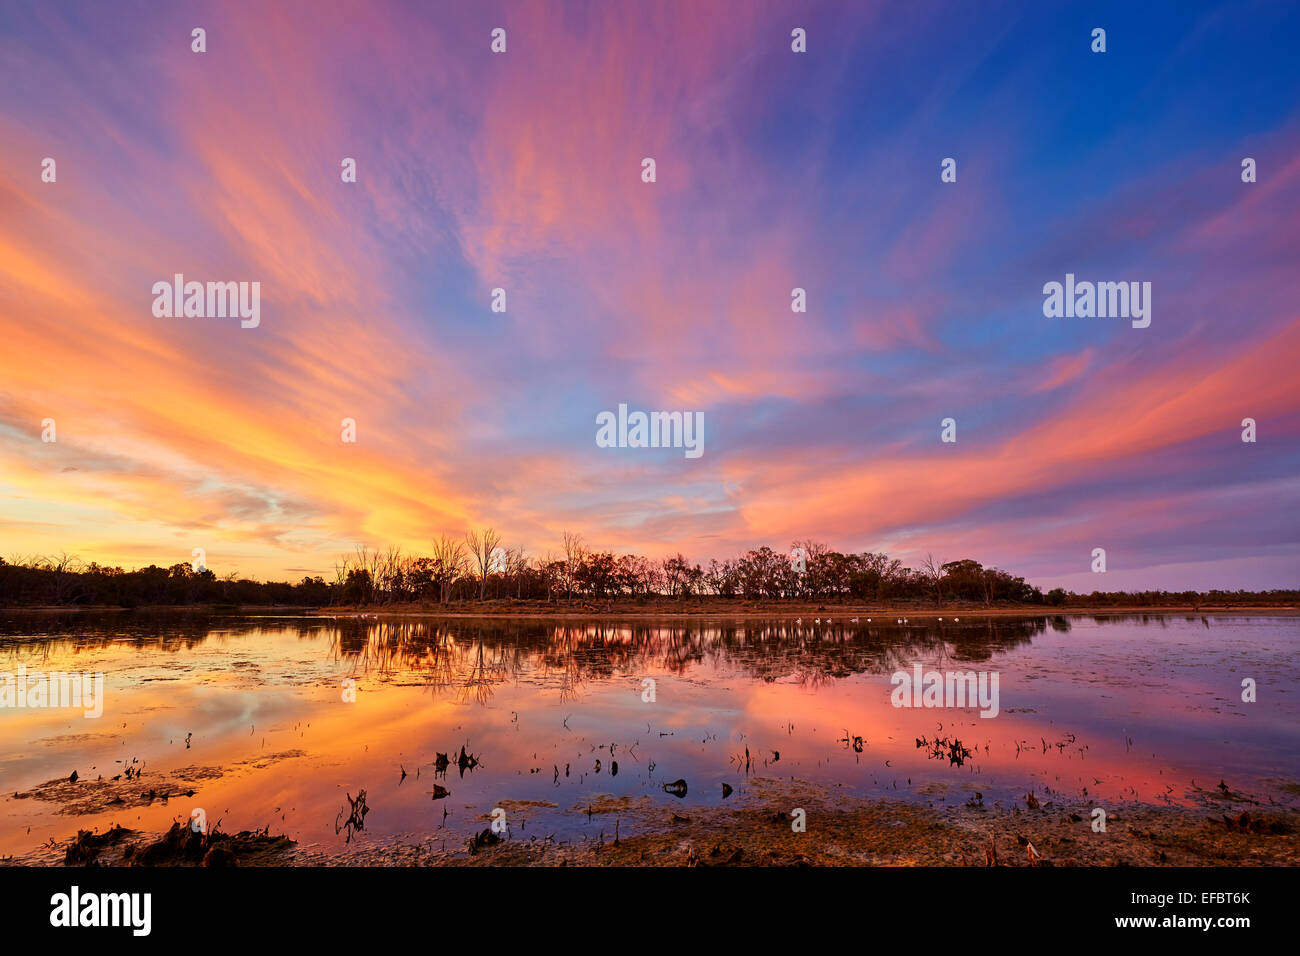 Sunsetting over a small billabong beside the River Murray near Merbein. - Stock Image